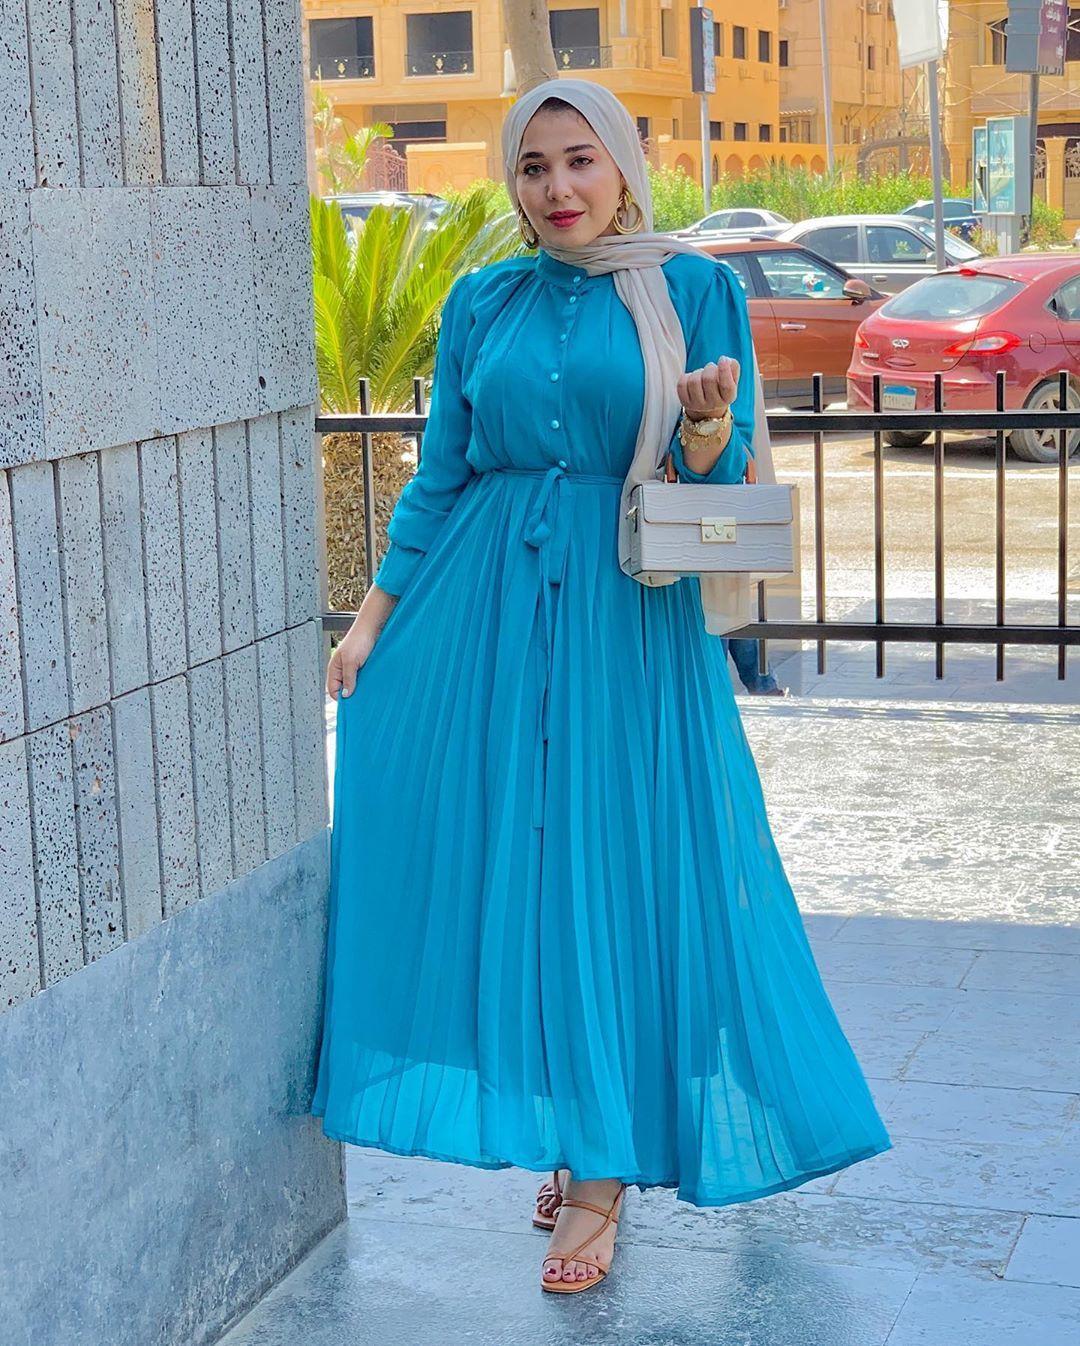 موديلات فساتين للمحجبات للخروج 2021 Formal Dresses Long Long Sleeve Dress Dresses